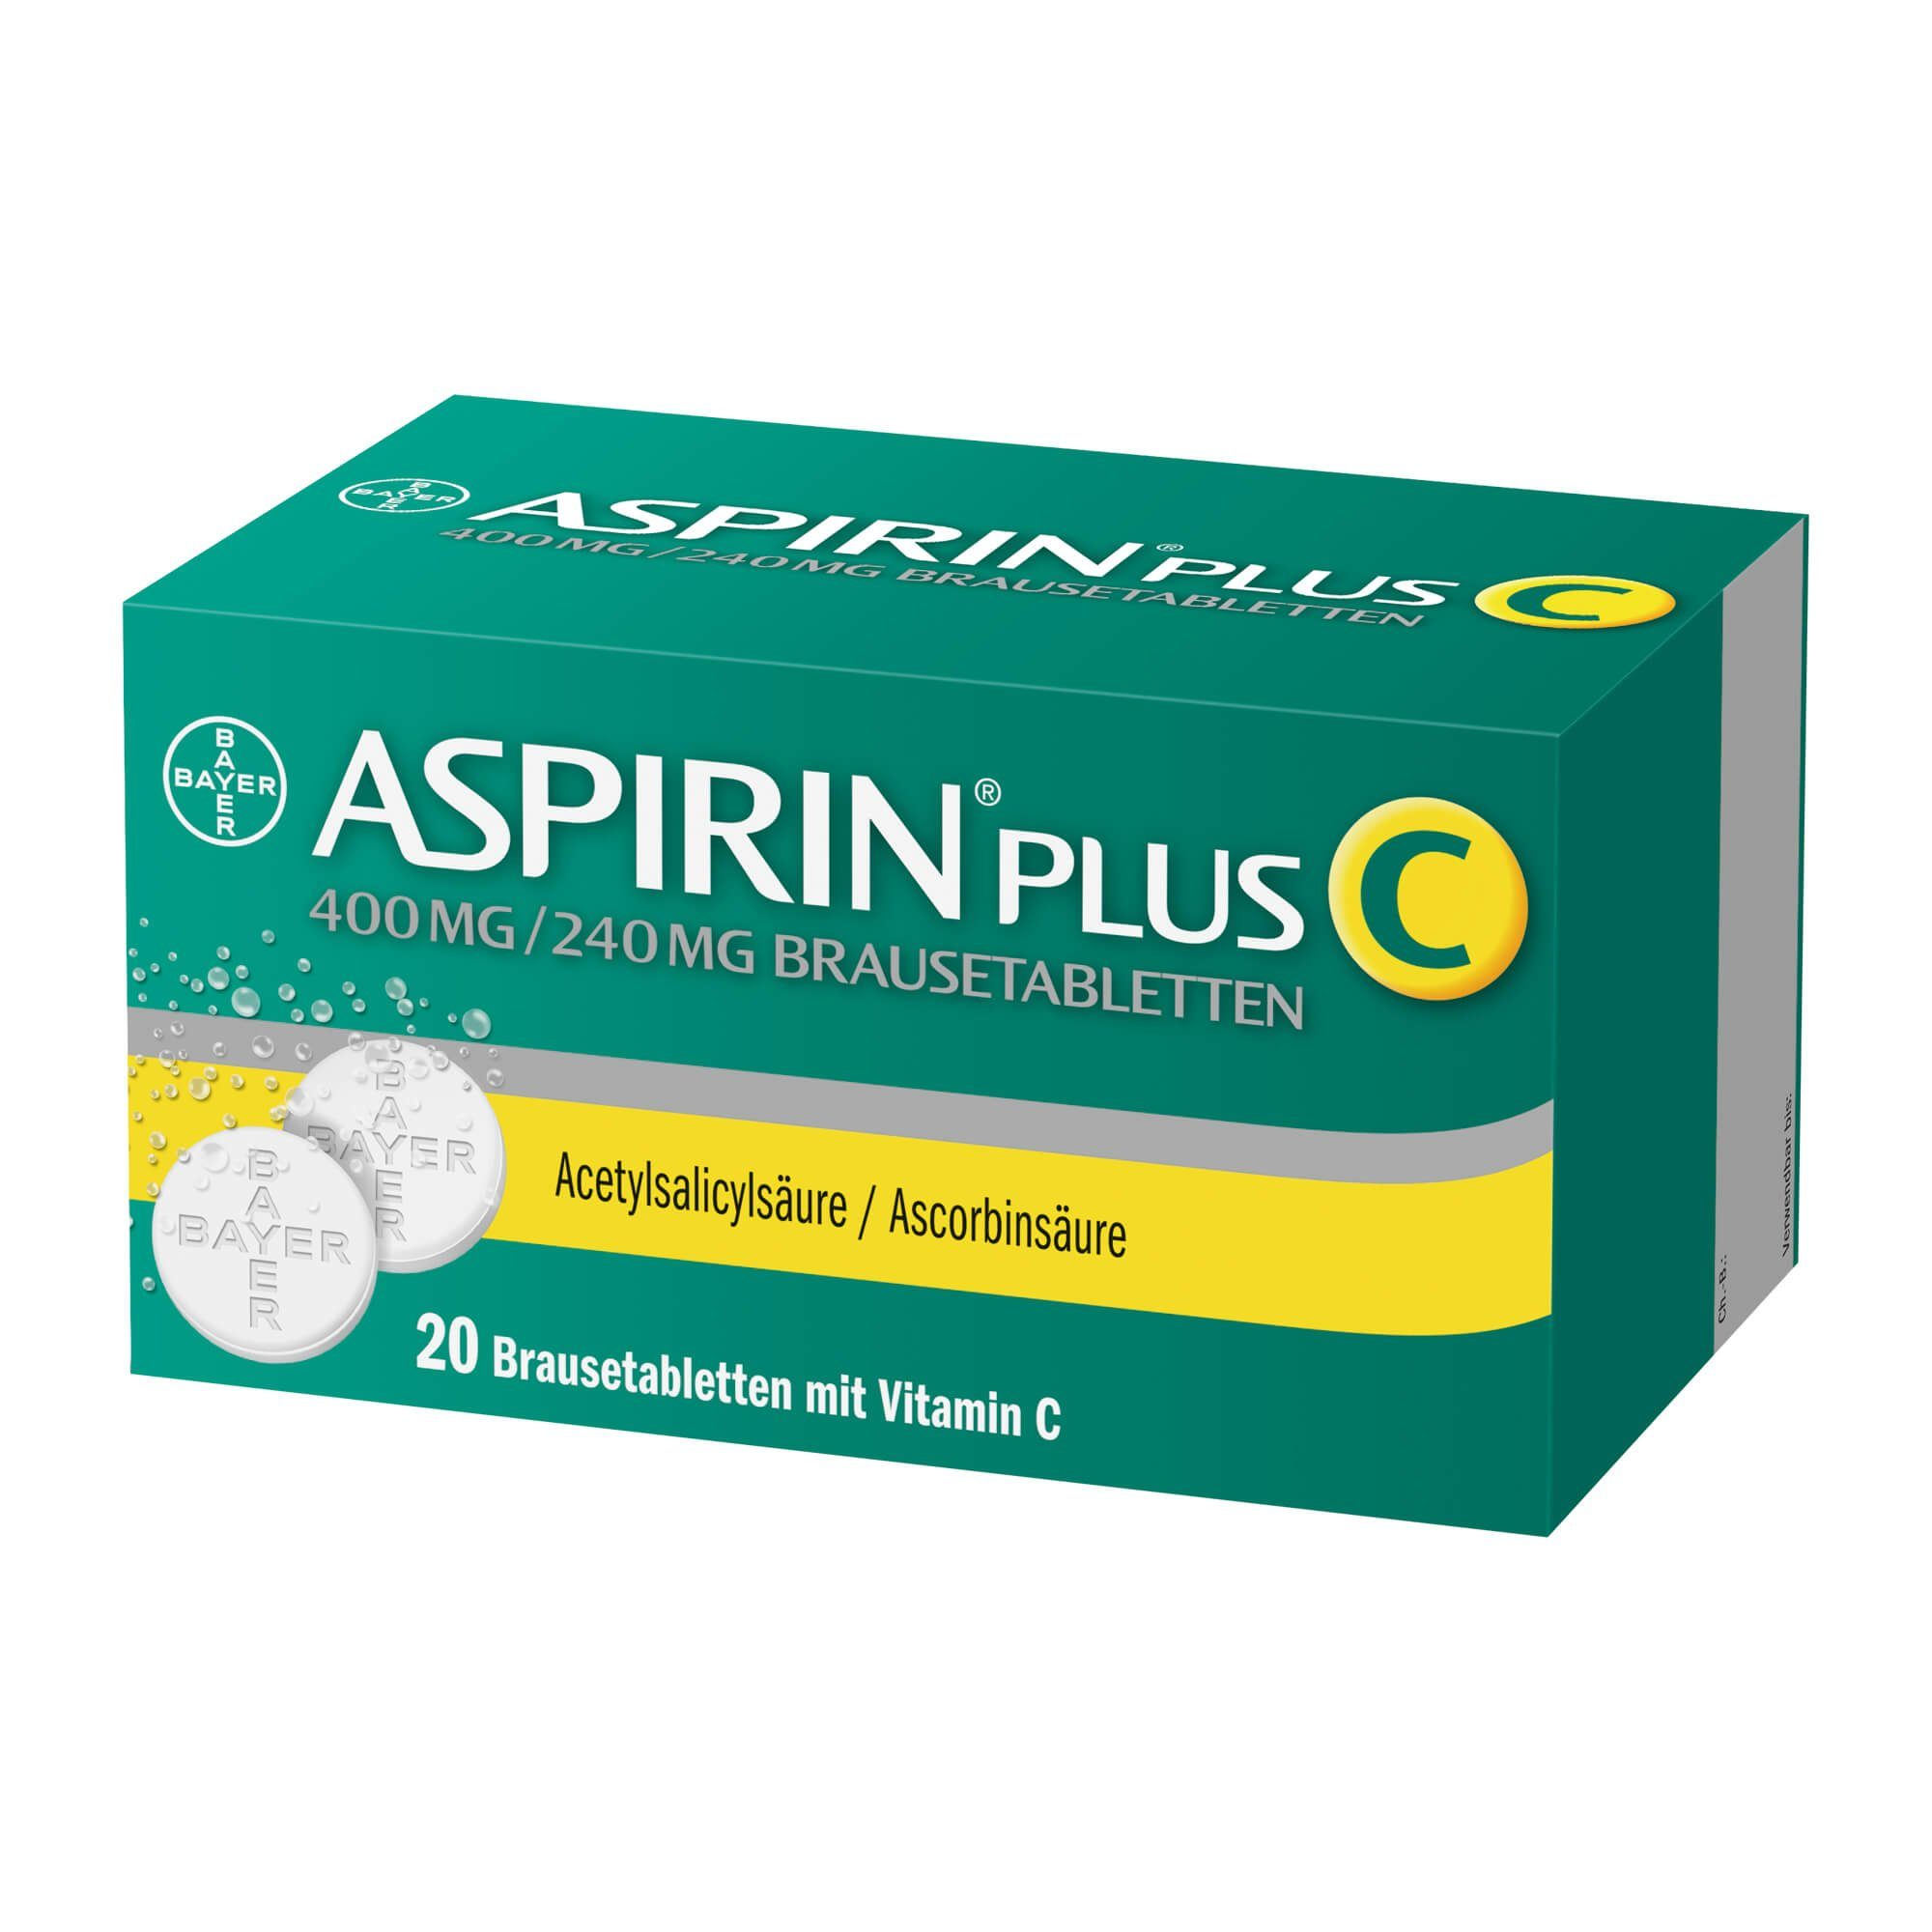 Aspirin Plus C Brausetabletten, 20 St